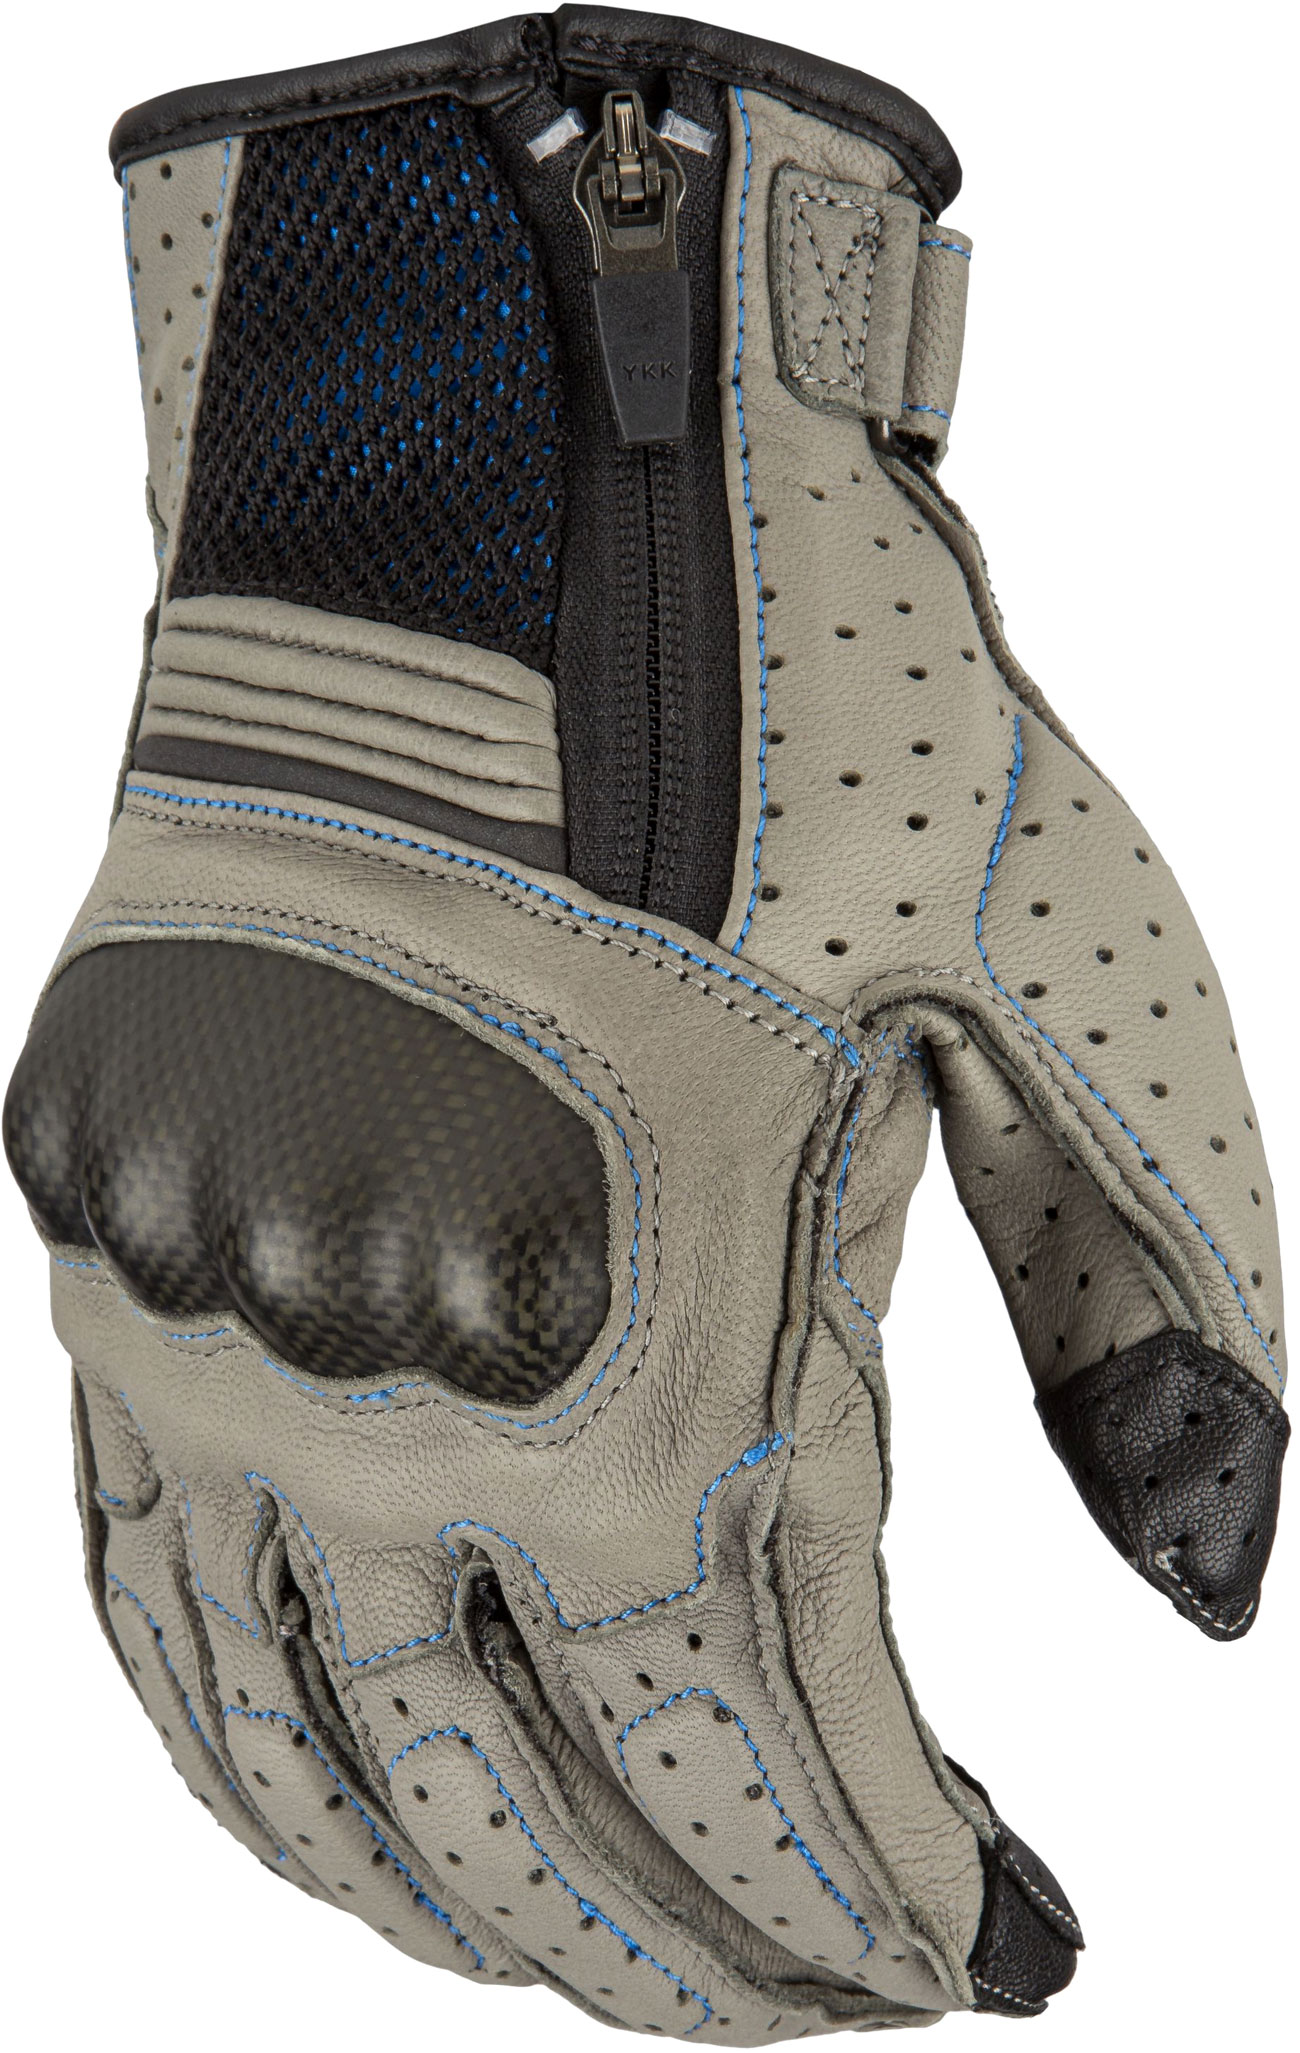 Klim Induction S20, Handschuhe - Grau/Blau - L 5028-001-140-601